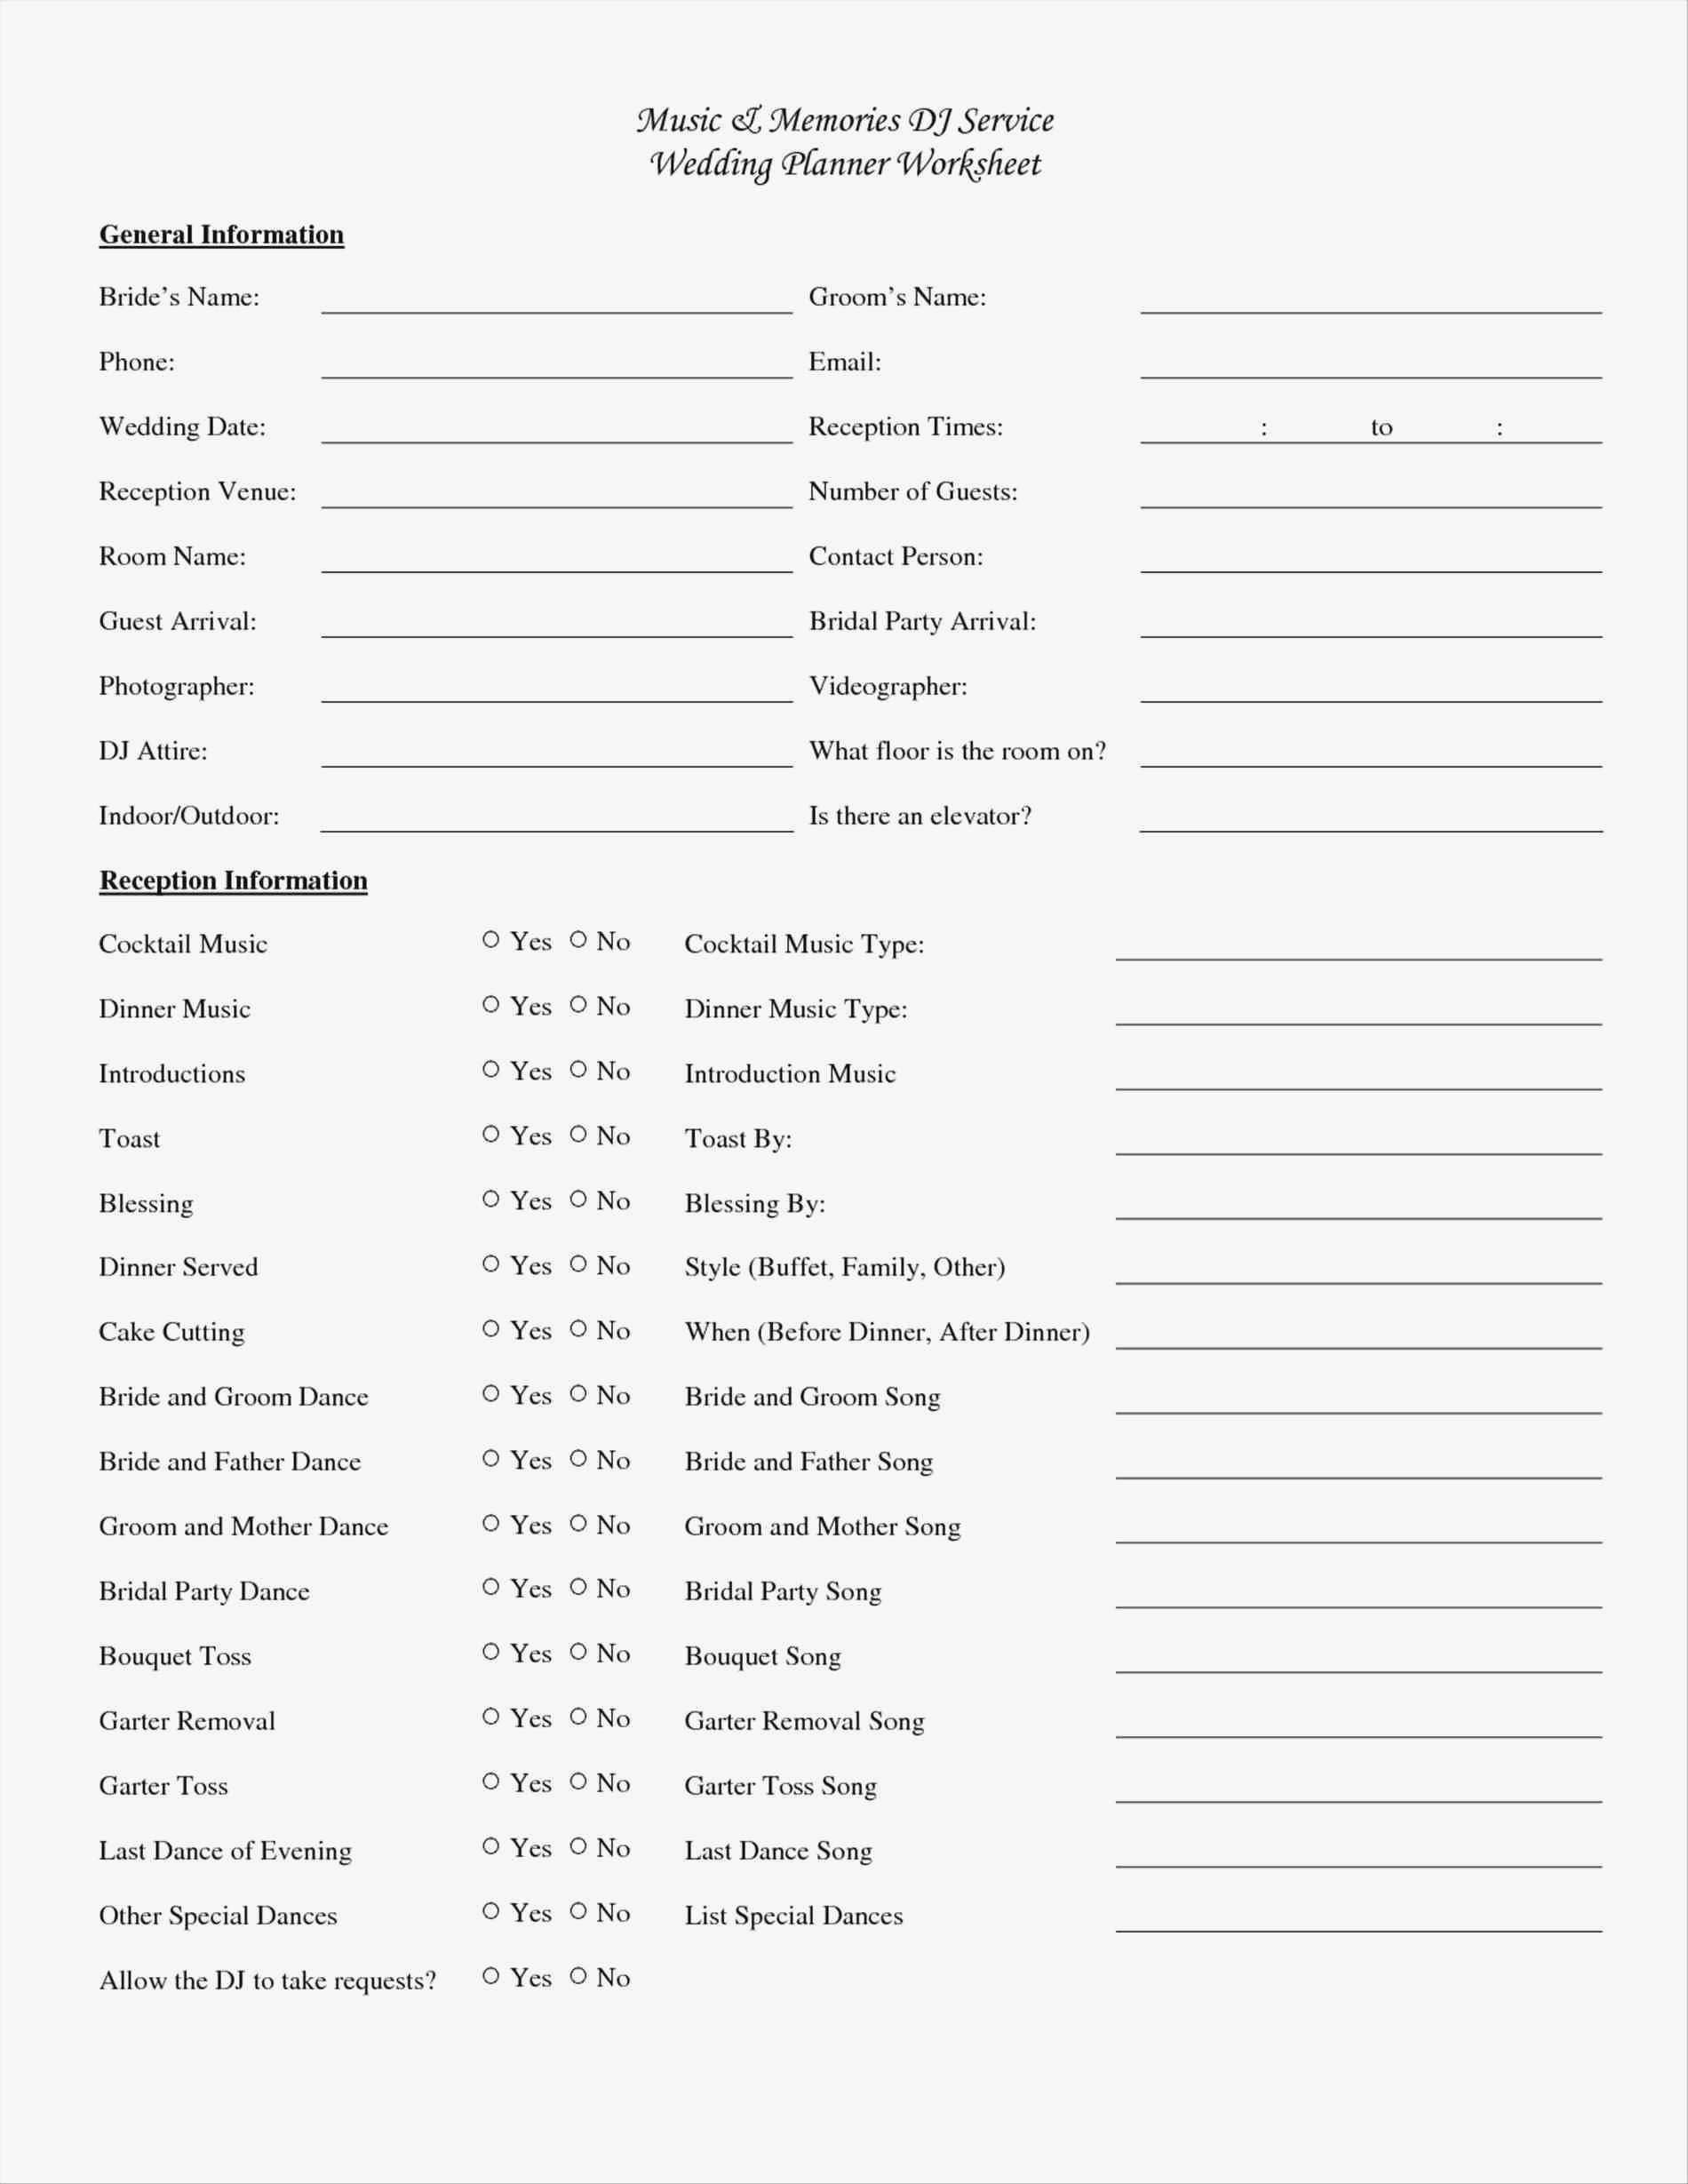 Catholic Wedding Booklet Template Free